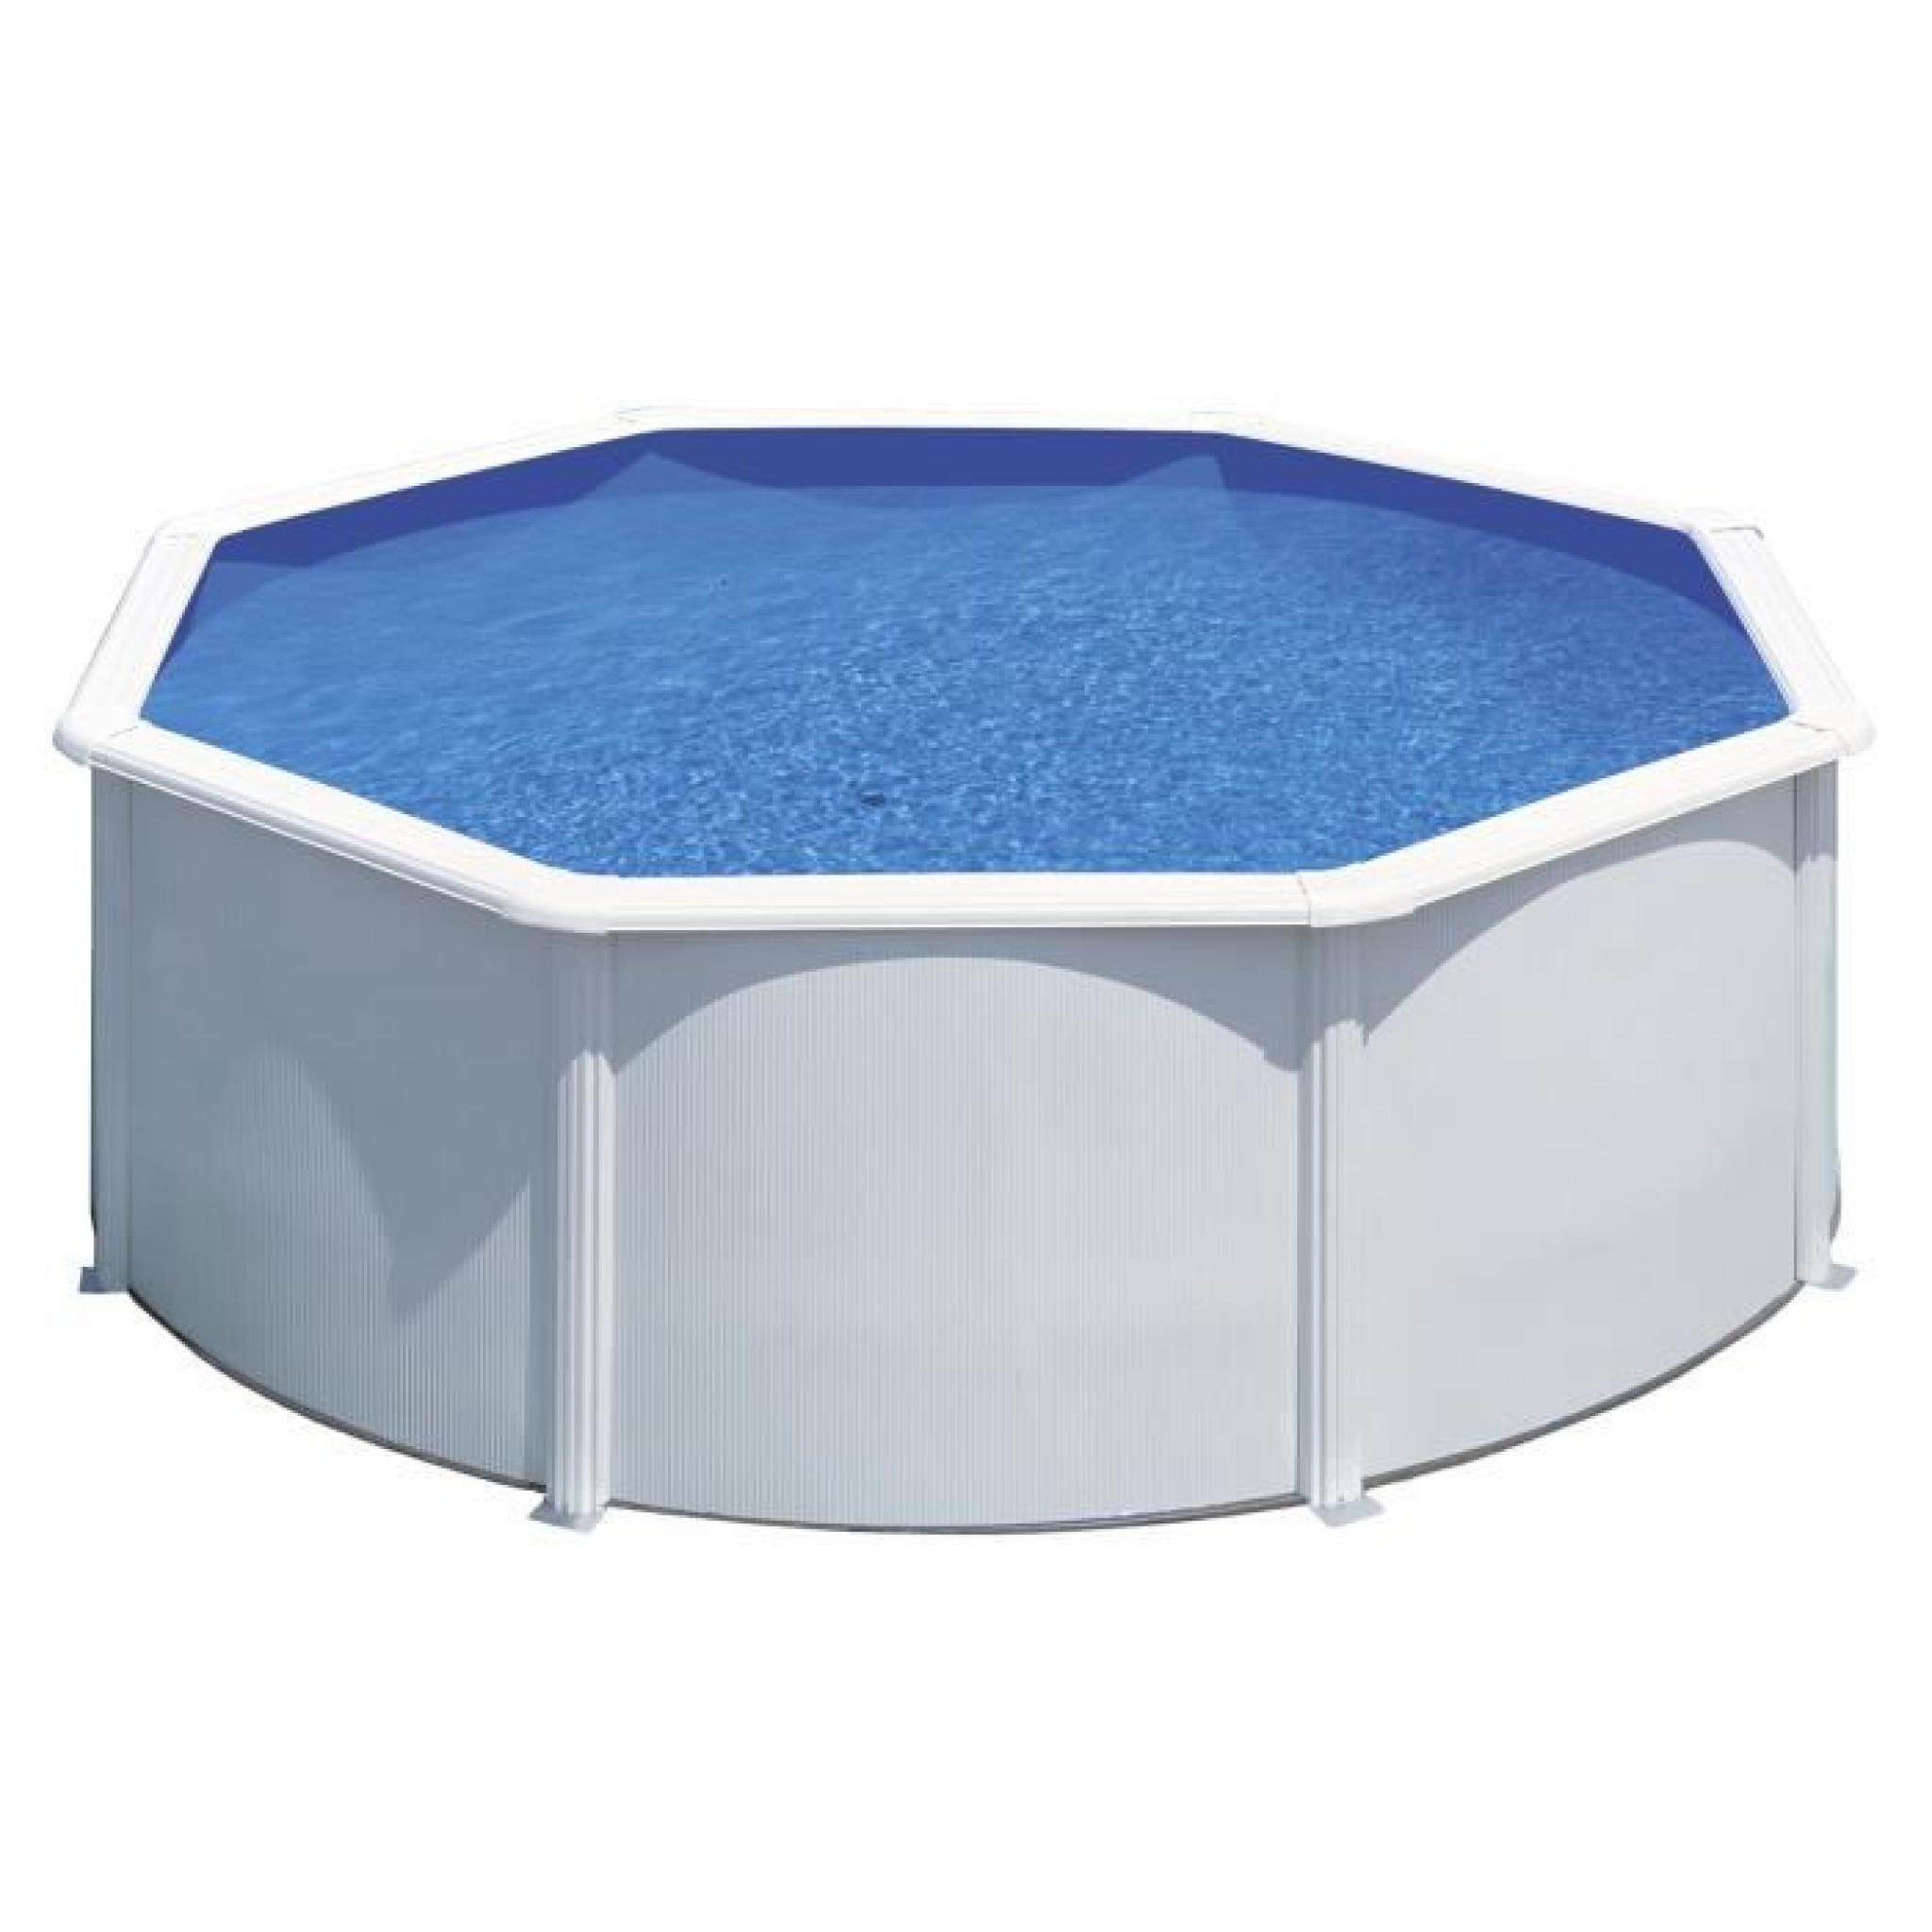 Gre Kit Piscine Hors-Sol Ronde En Acier Wet Ø3,50X1,20 M - Liner Bleu dedans Echelle Piscine Hors Sol Pas Cher